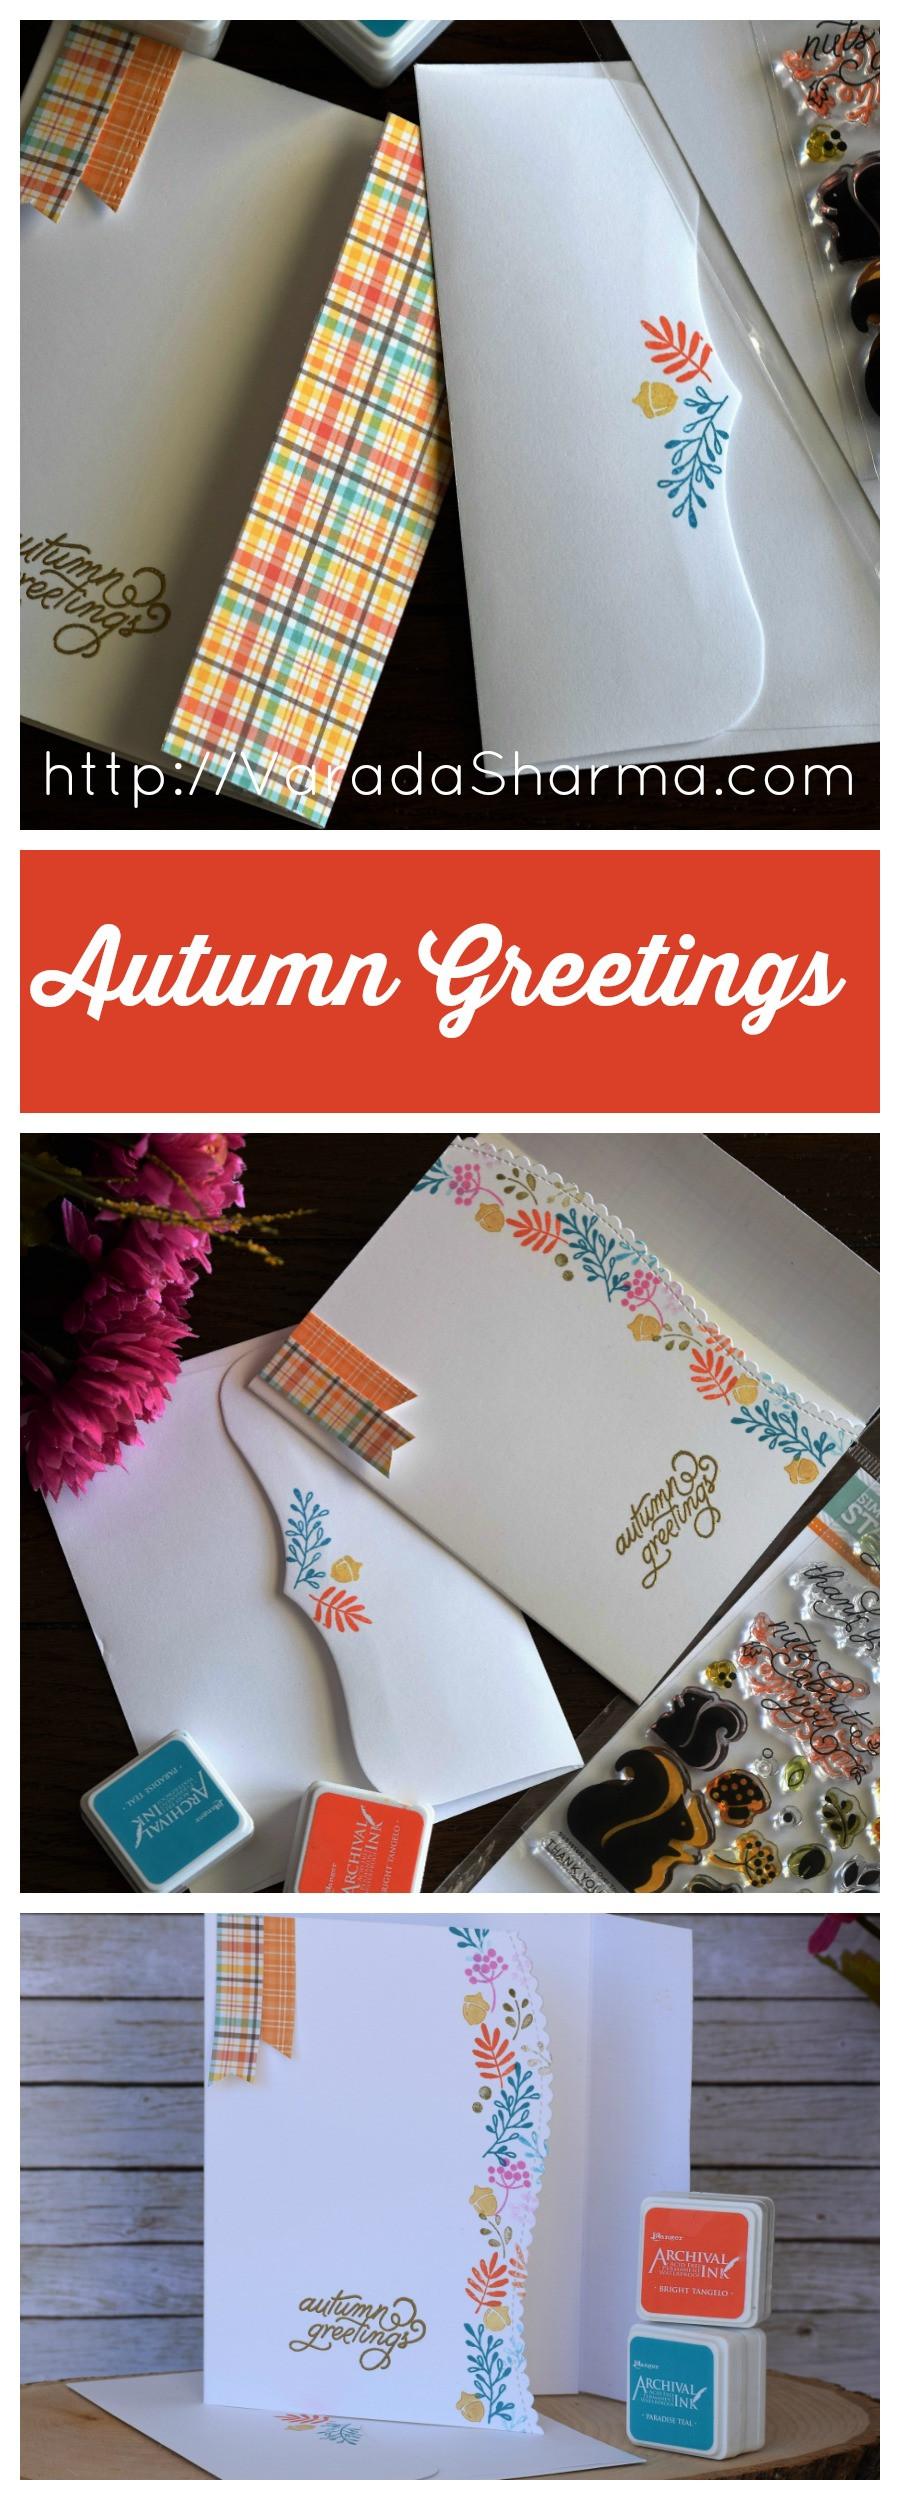 pinnable-autumn-greetings